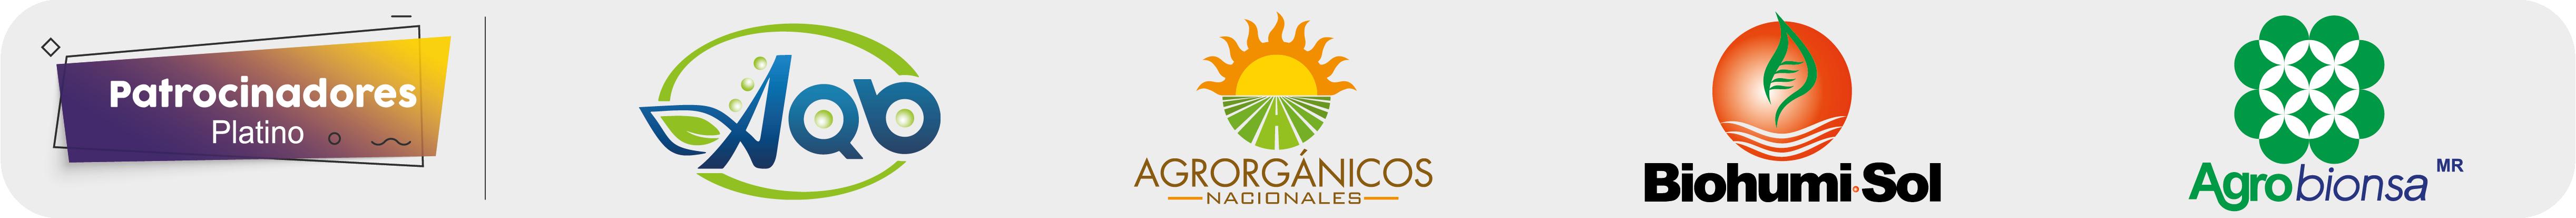 https://fitosanidad.com/wp-content/uploads/2019/07/Slide-Patrocinadores_2.png